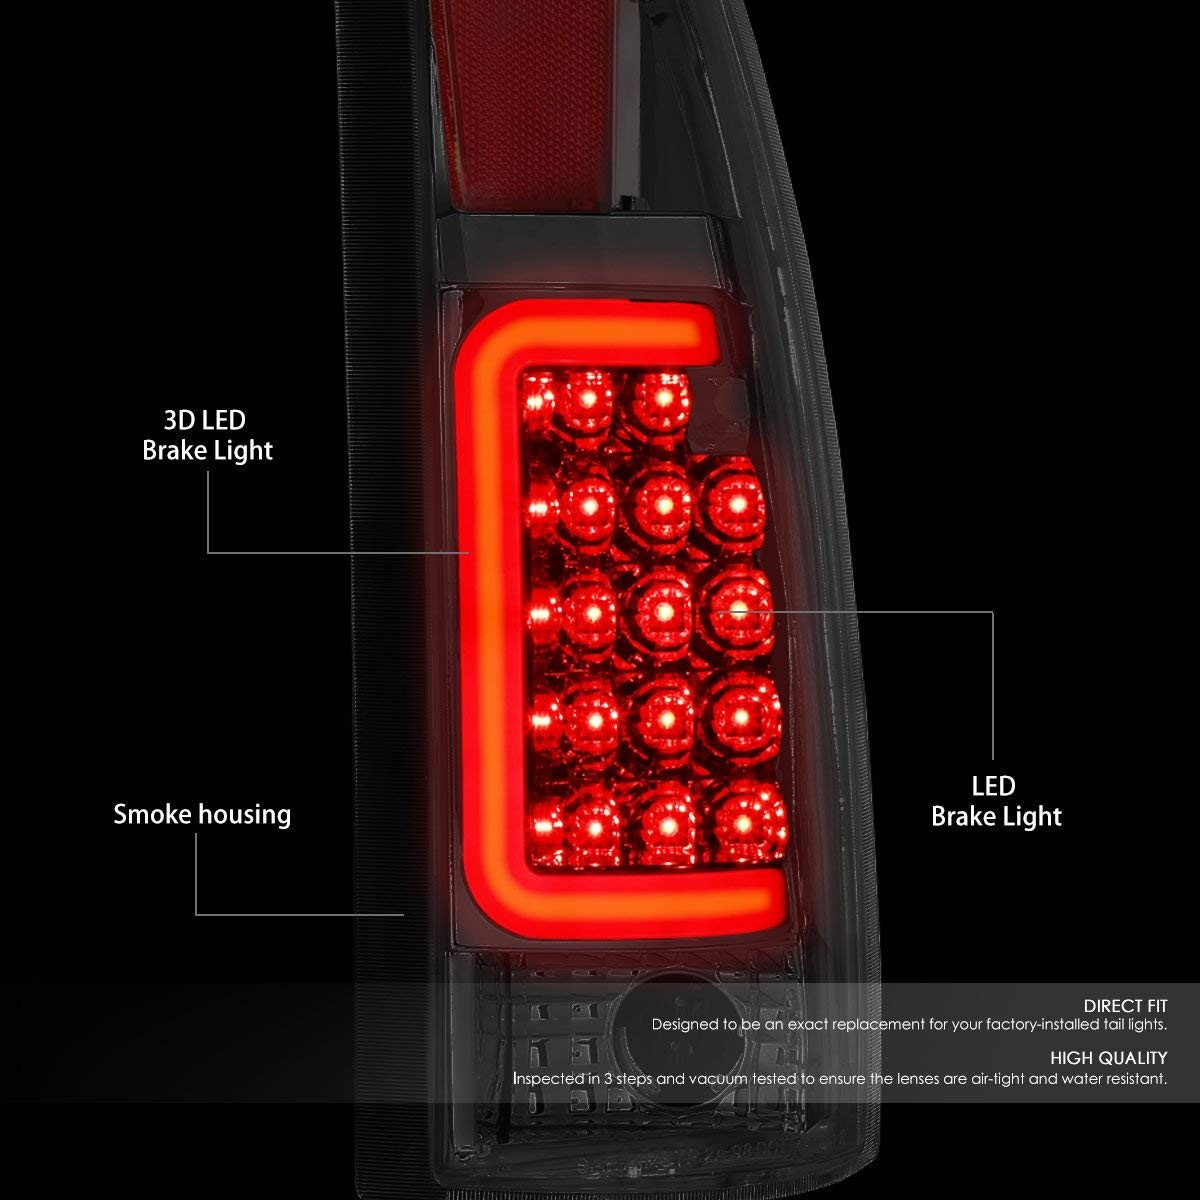 Amazon For Chevy GMC C K Series Pair of 3D LED Tail Brake Light Chrome Housing Smoked Lens Automotive